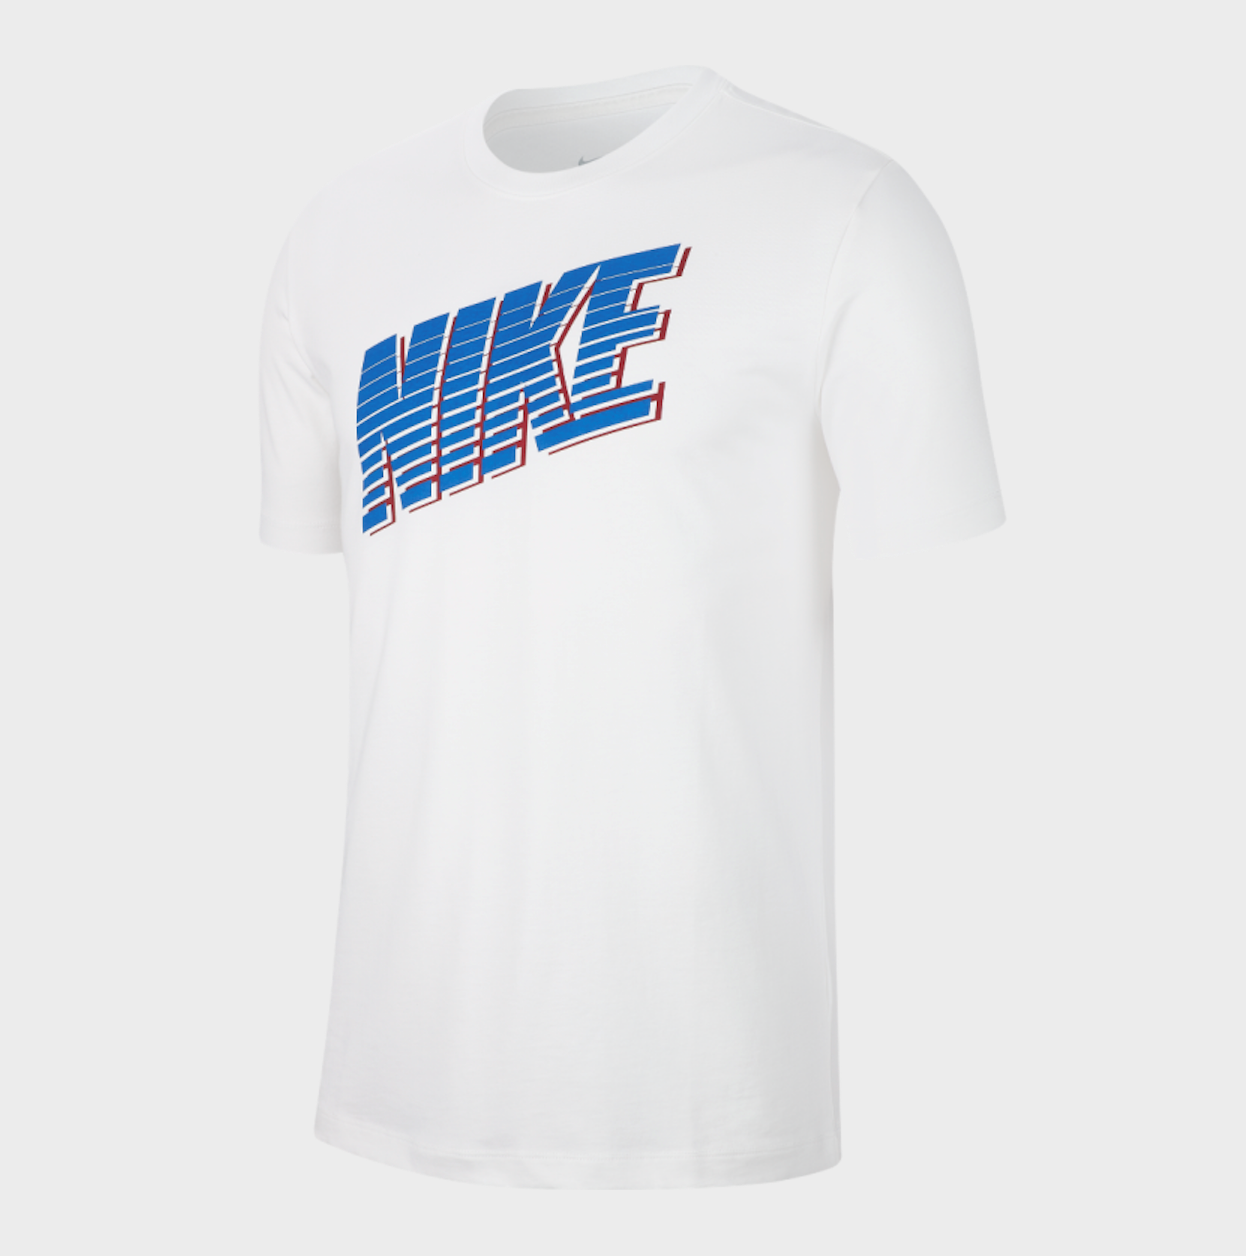 Bilde av Nike M tee nike block CK2777-100